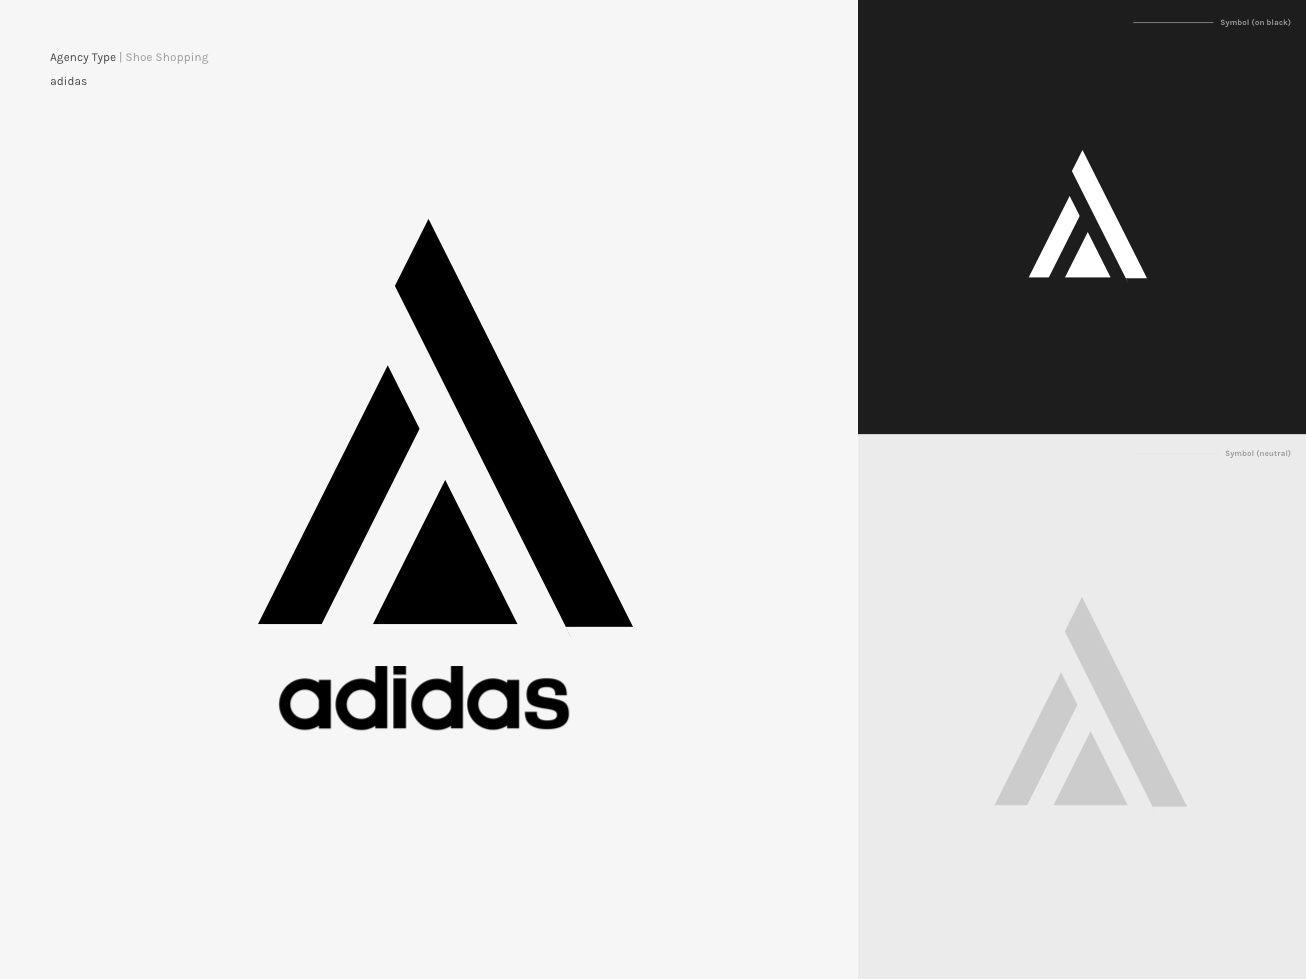 Adidas Re Design Adidas Logo Redesign Logos